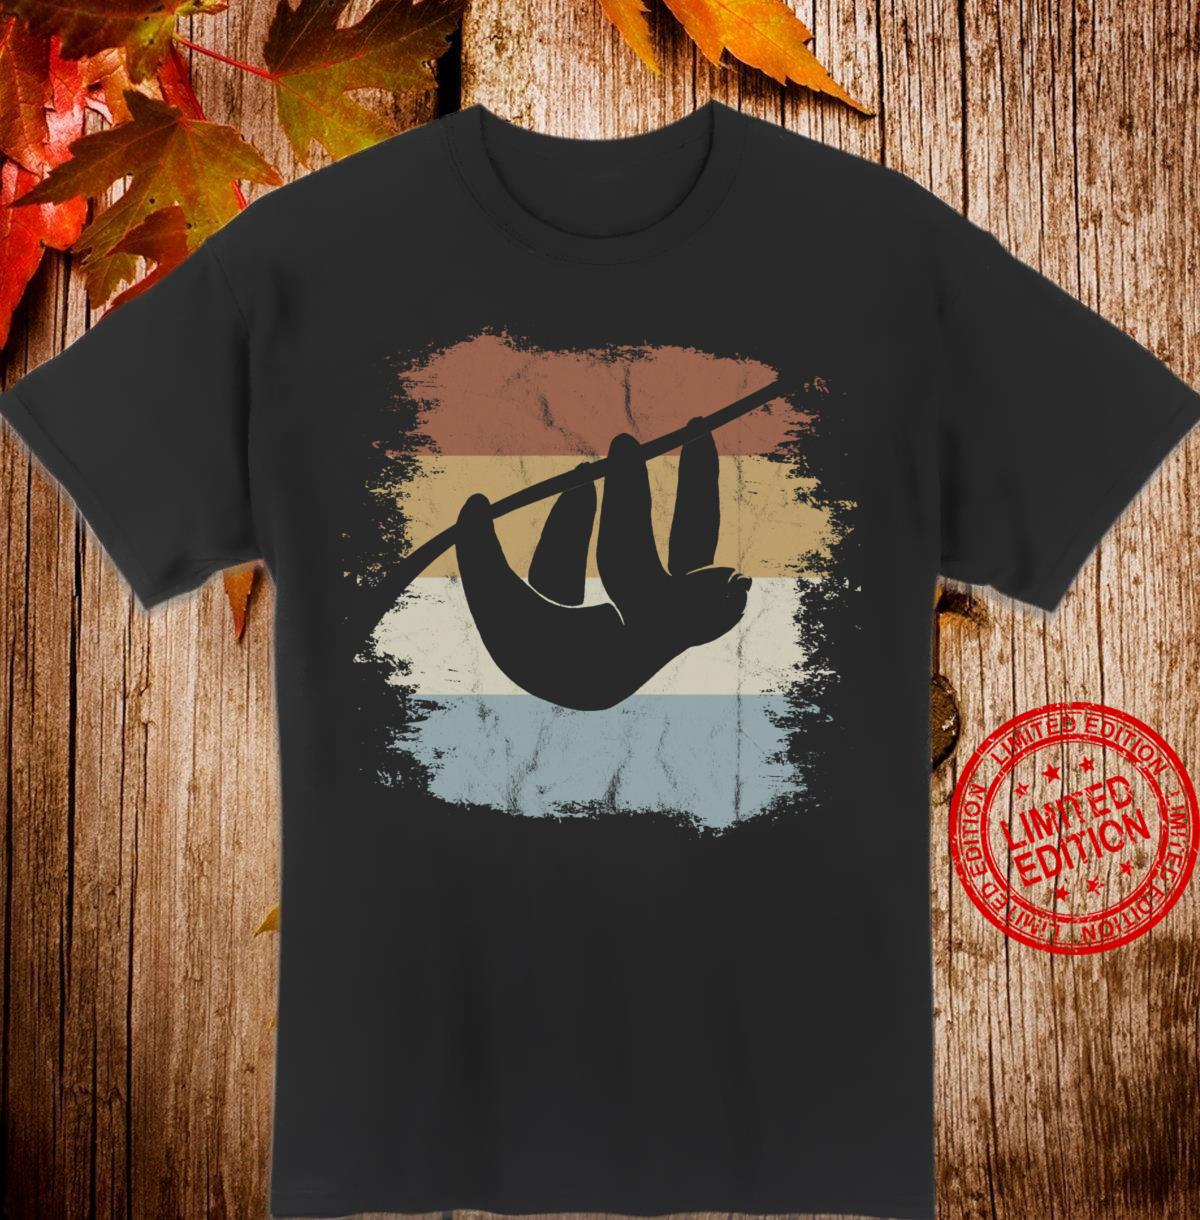 Vintage Style Chill Mal Retro Sloth Silhouette Shirt